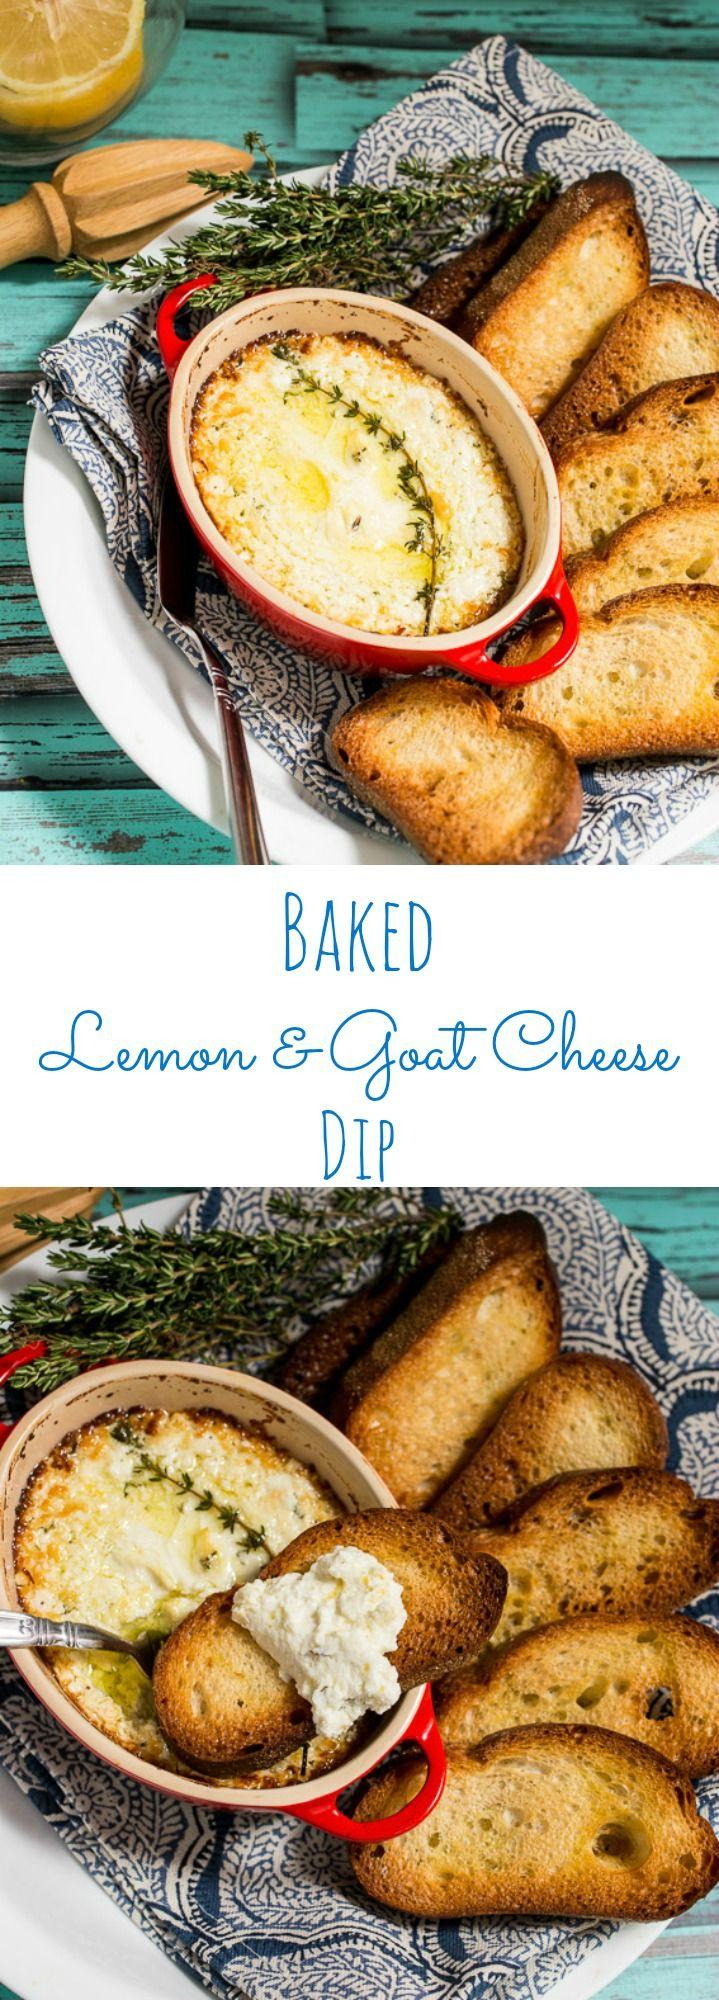 Baked Lemon and Goat Cheese Dip #SundaySupper| girlinthelittleredkitchen.com